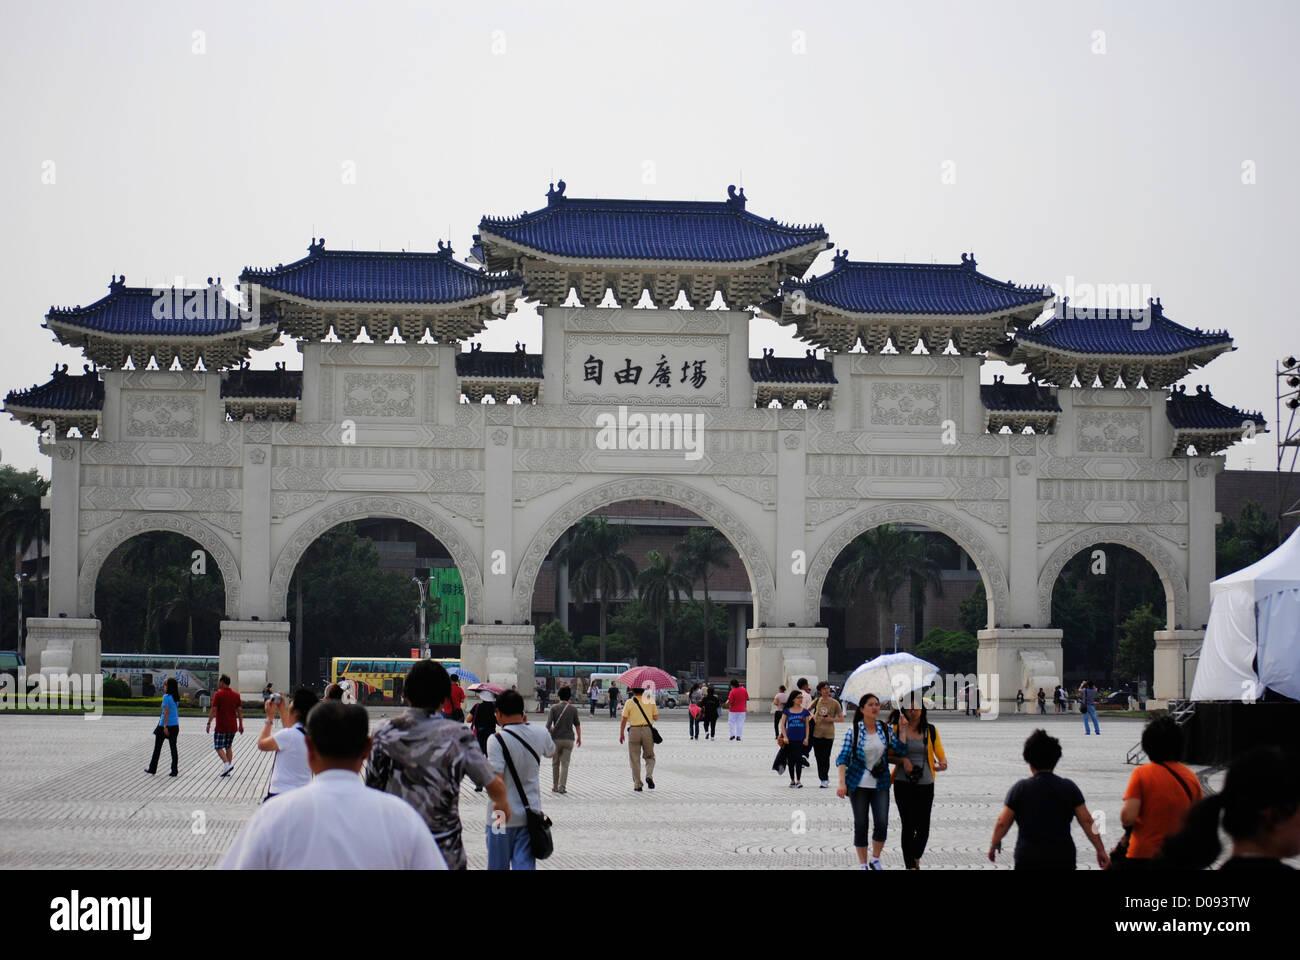 I turisti a CKS (Chiang Kai Shek memorial) Taipei Taiwan Immagini Stock